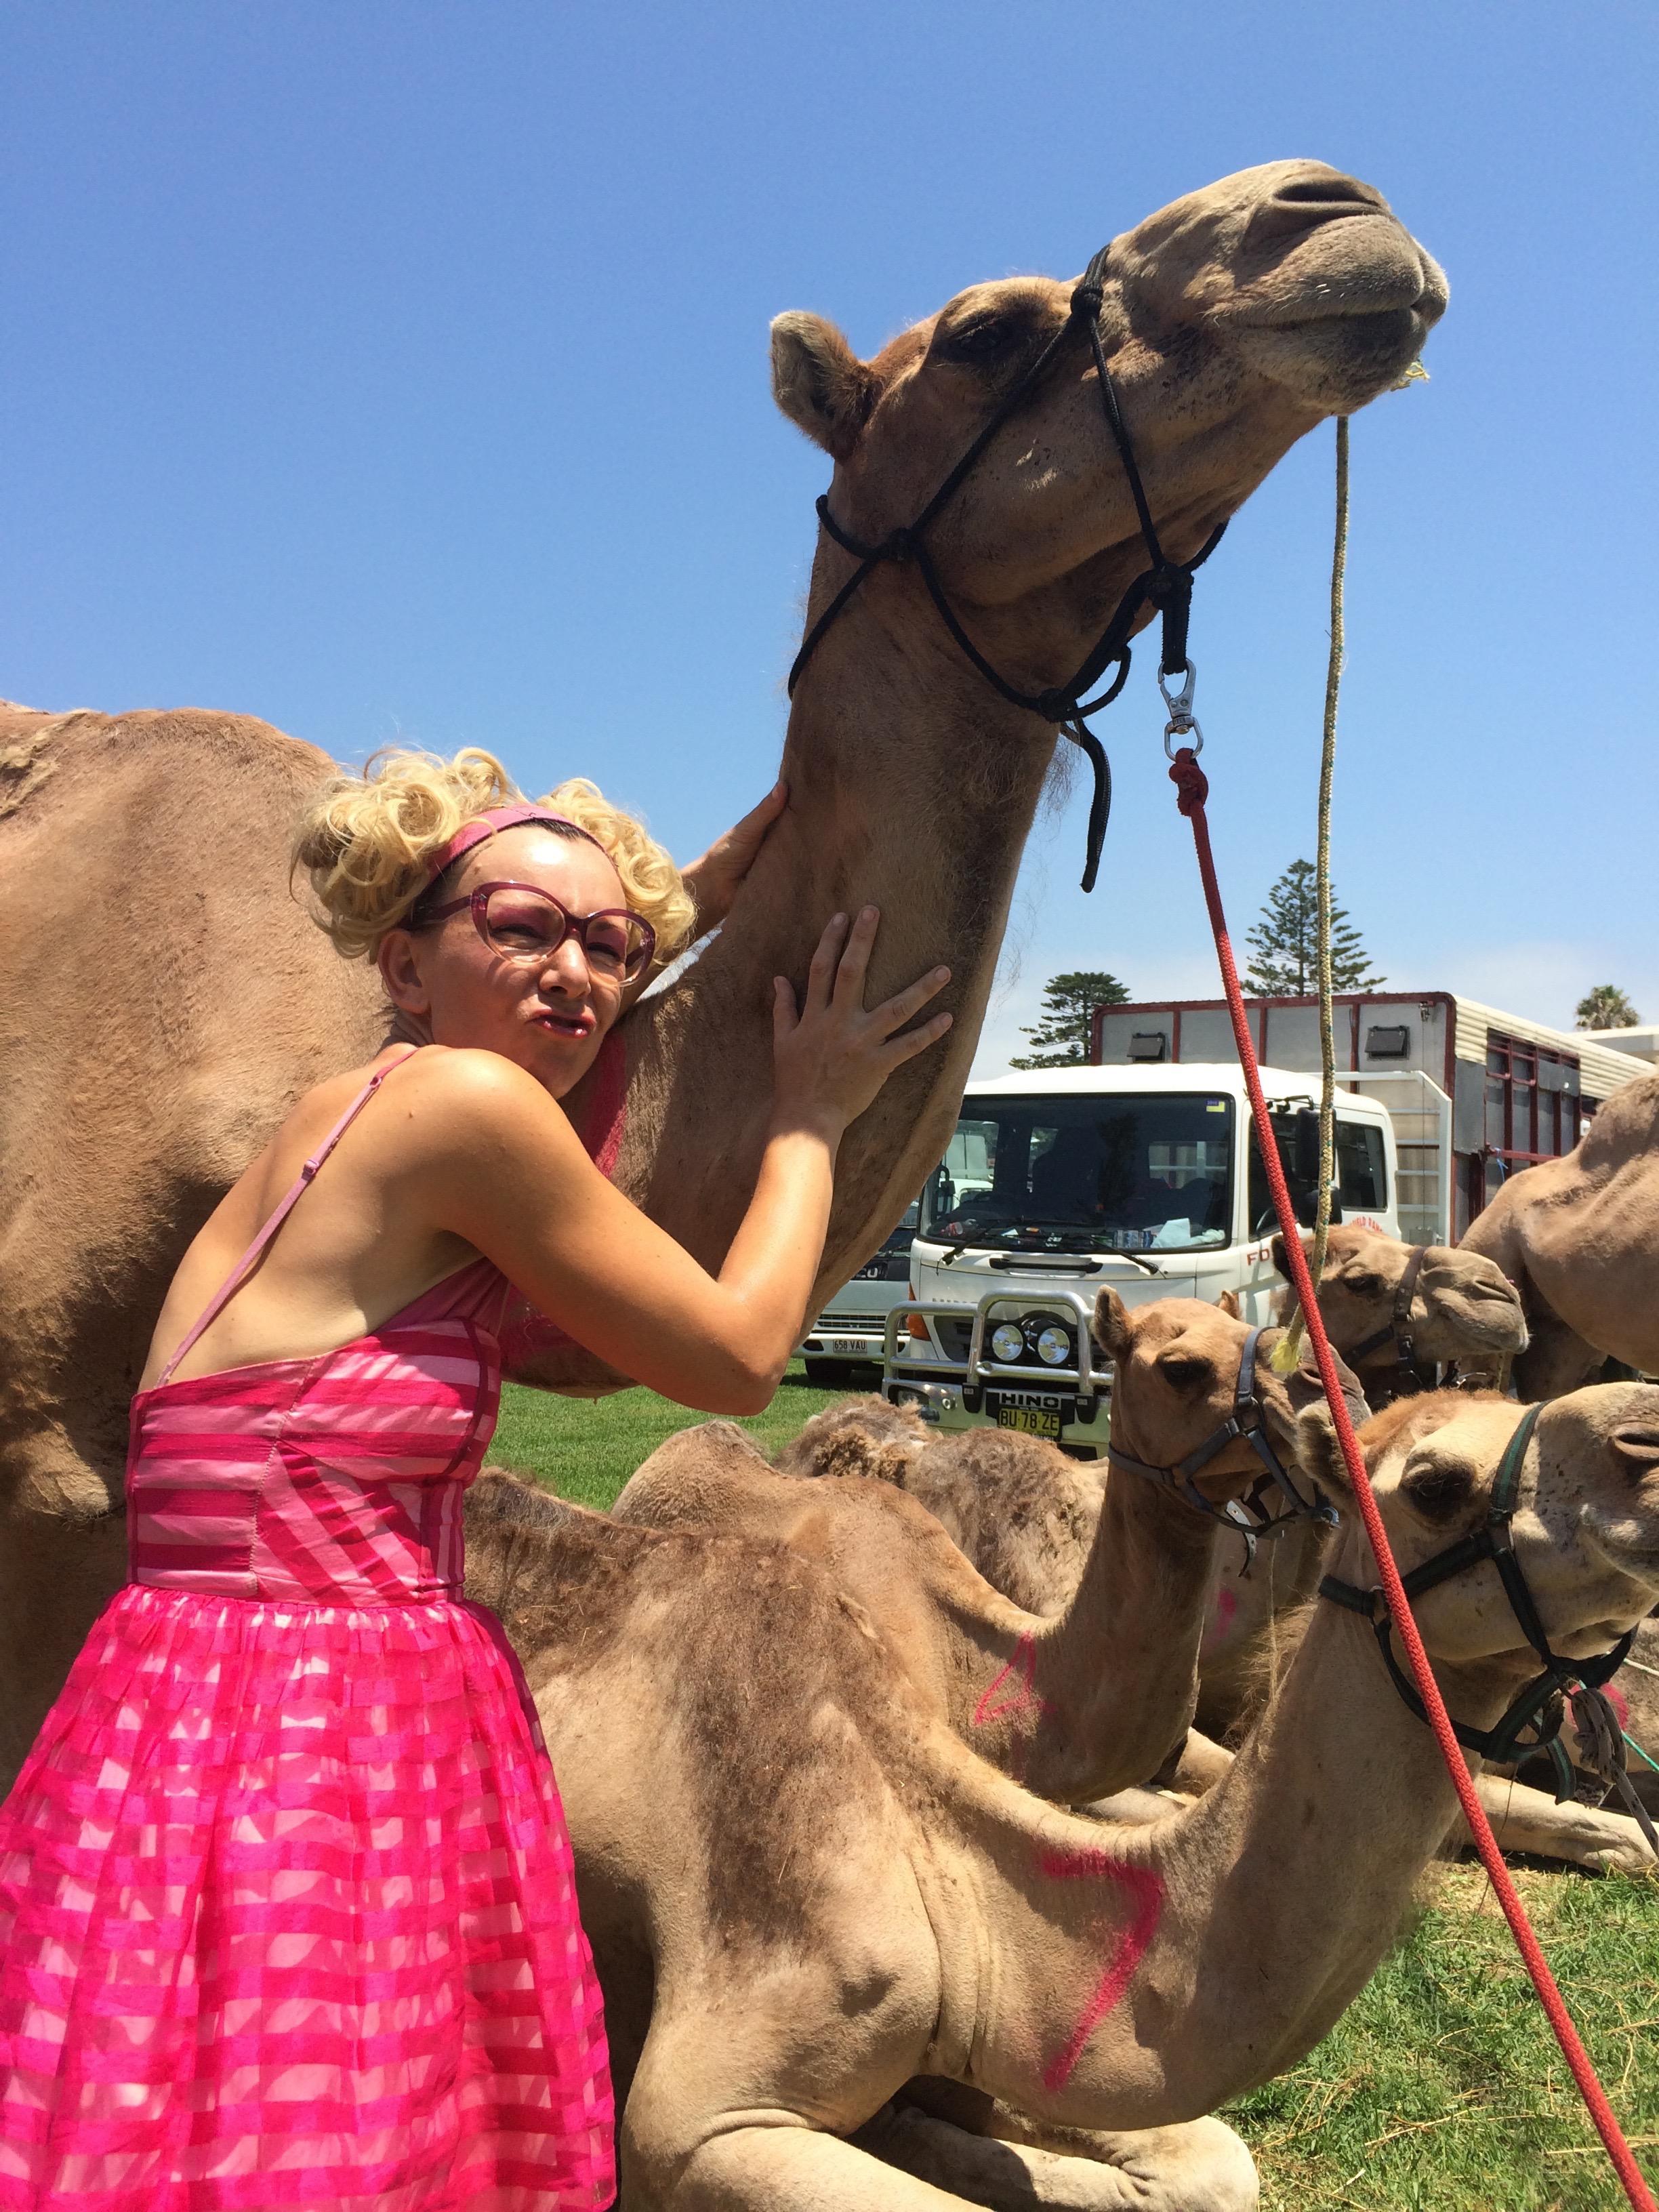 Kiki Camel